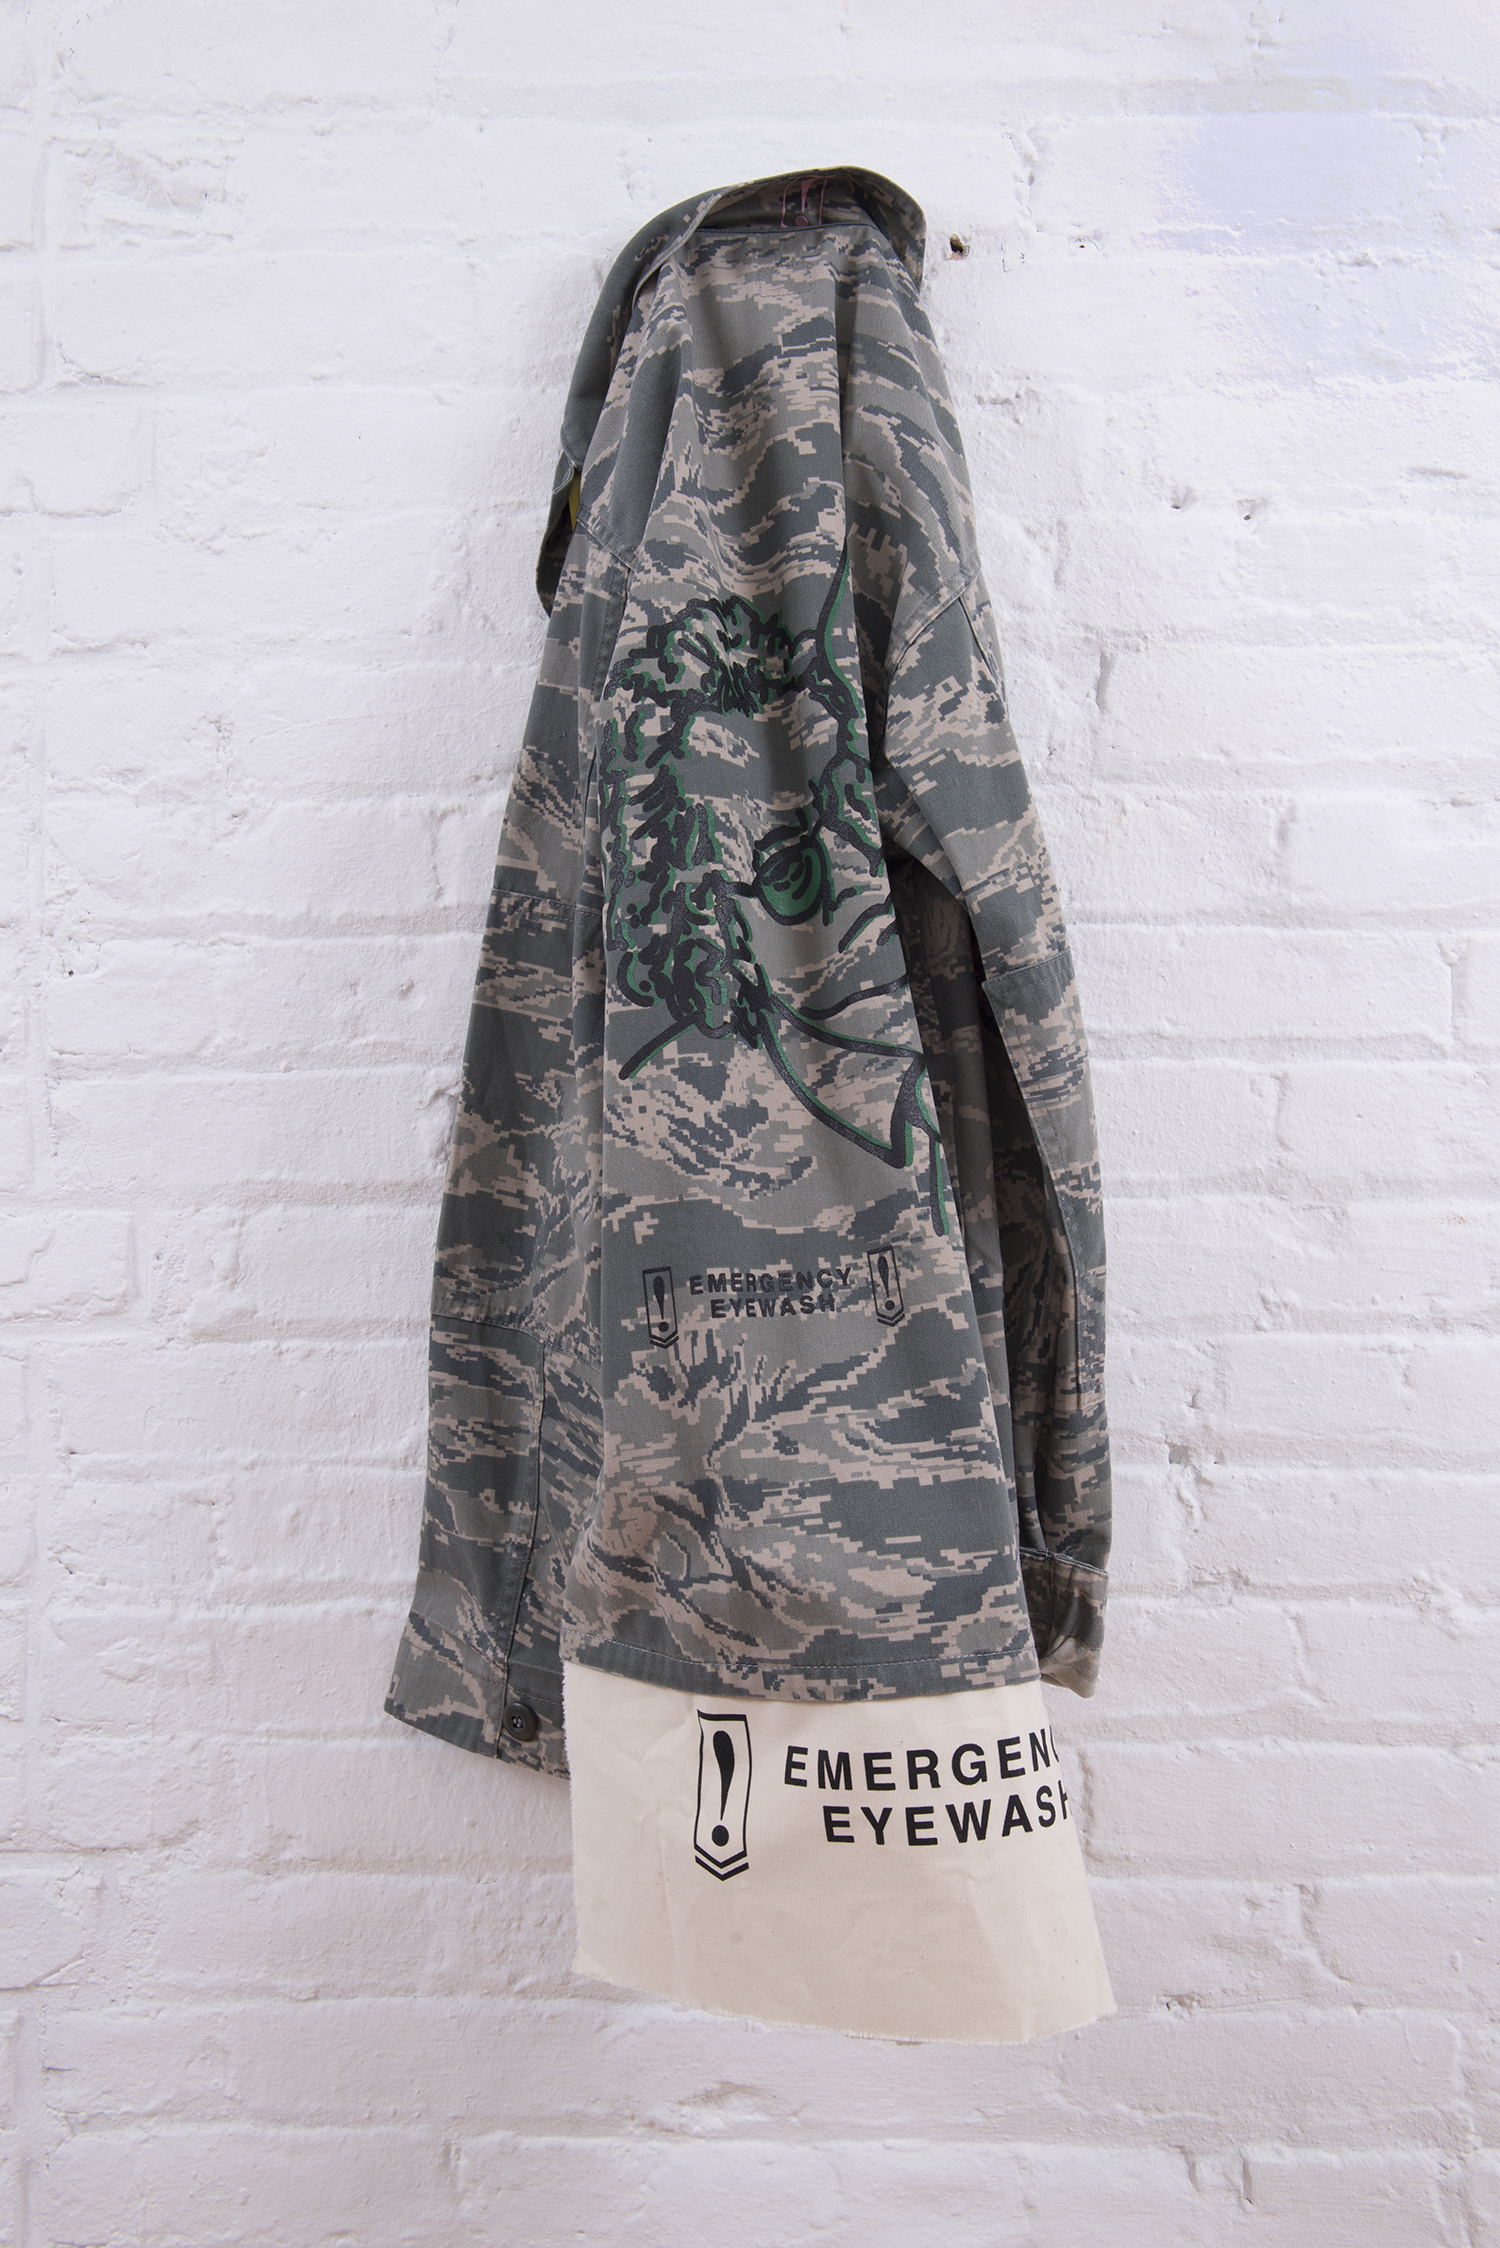 Ahem. Carol Szymanski & Xiaofu Wang. 2018. Vintage military camouflage jacket with Emergency Eyewash patches and silkscreen images